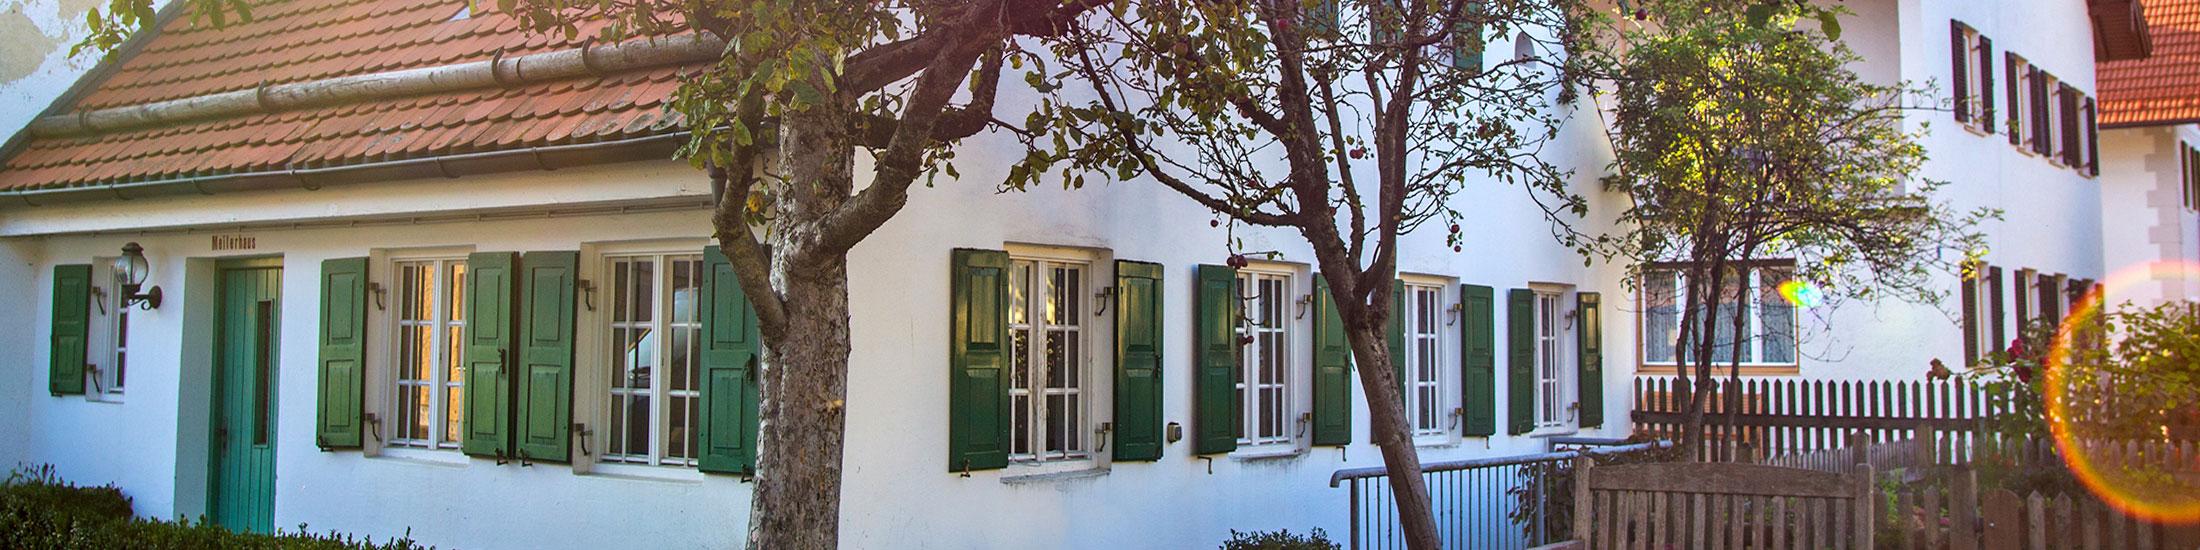 Das Meilerhaus in Heimstetten